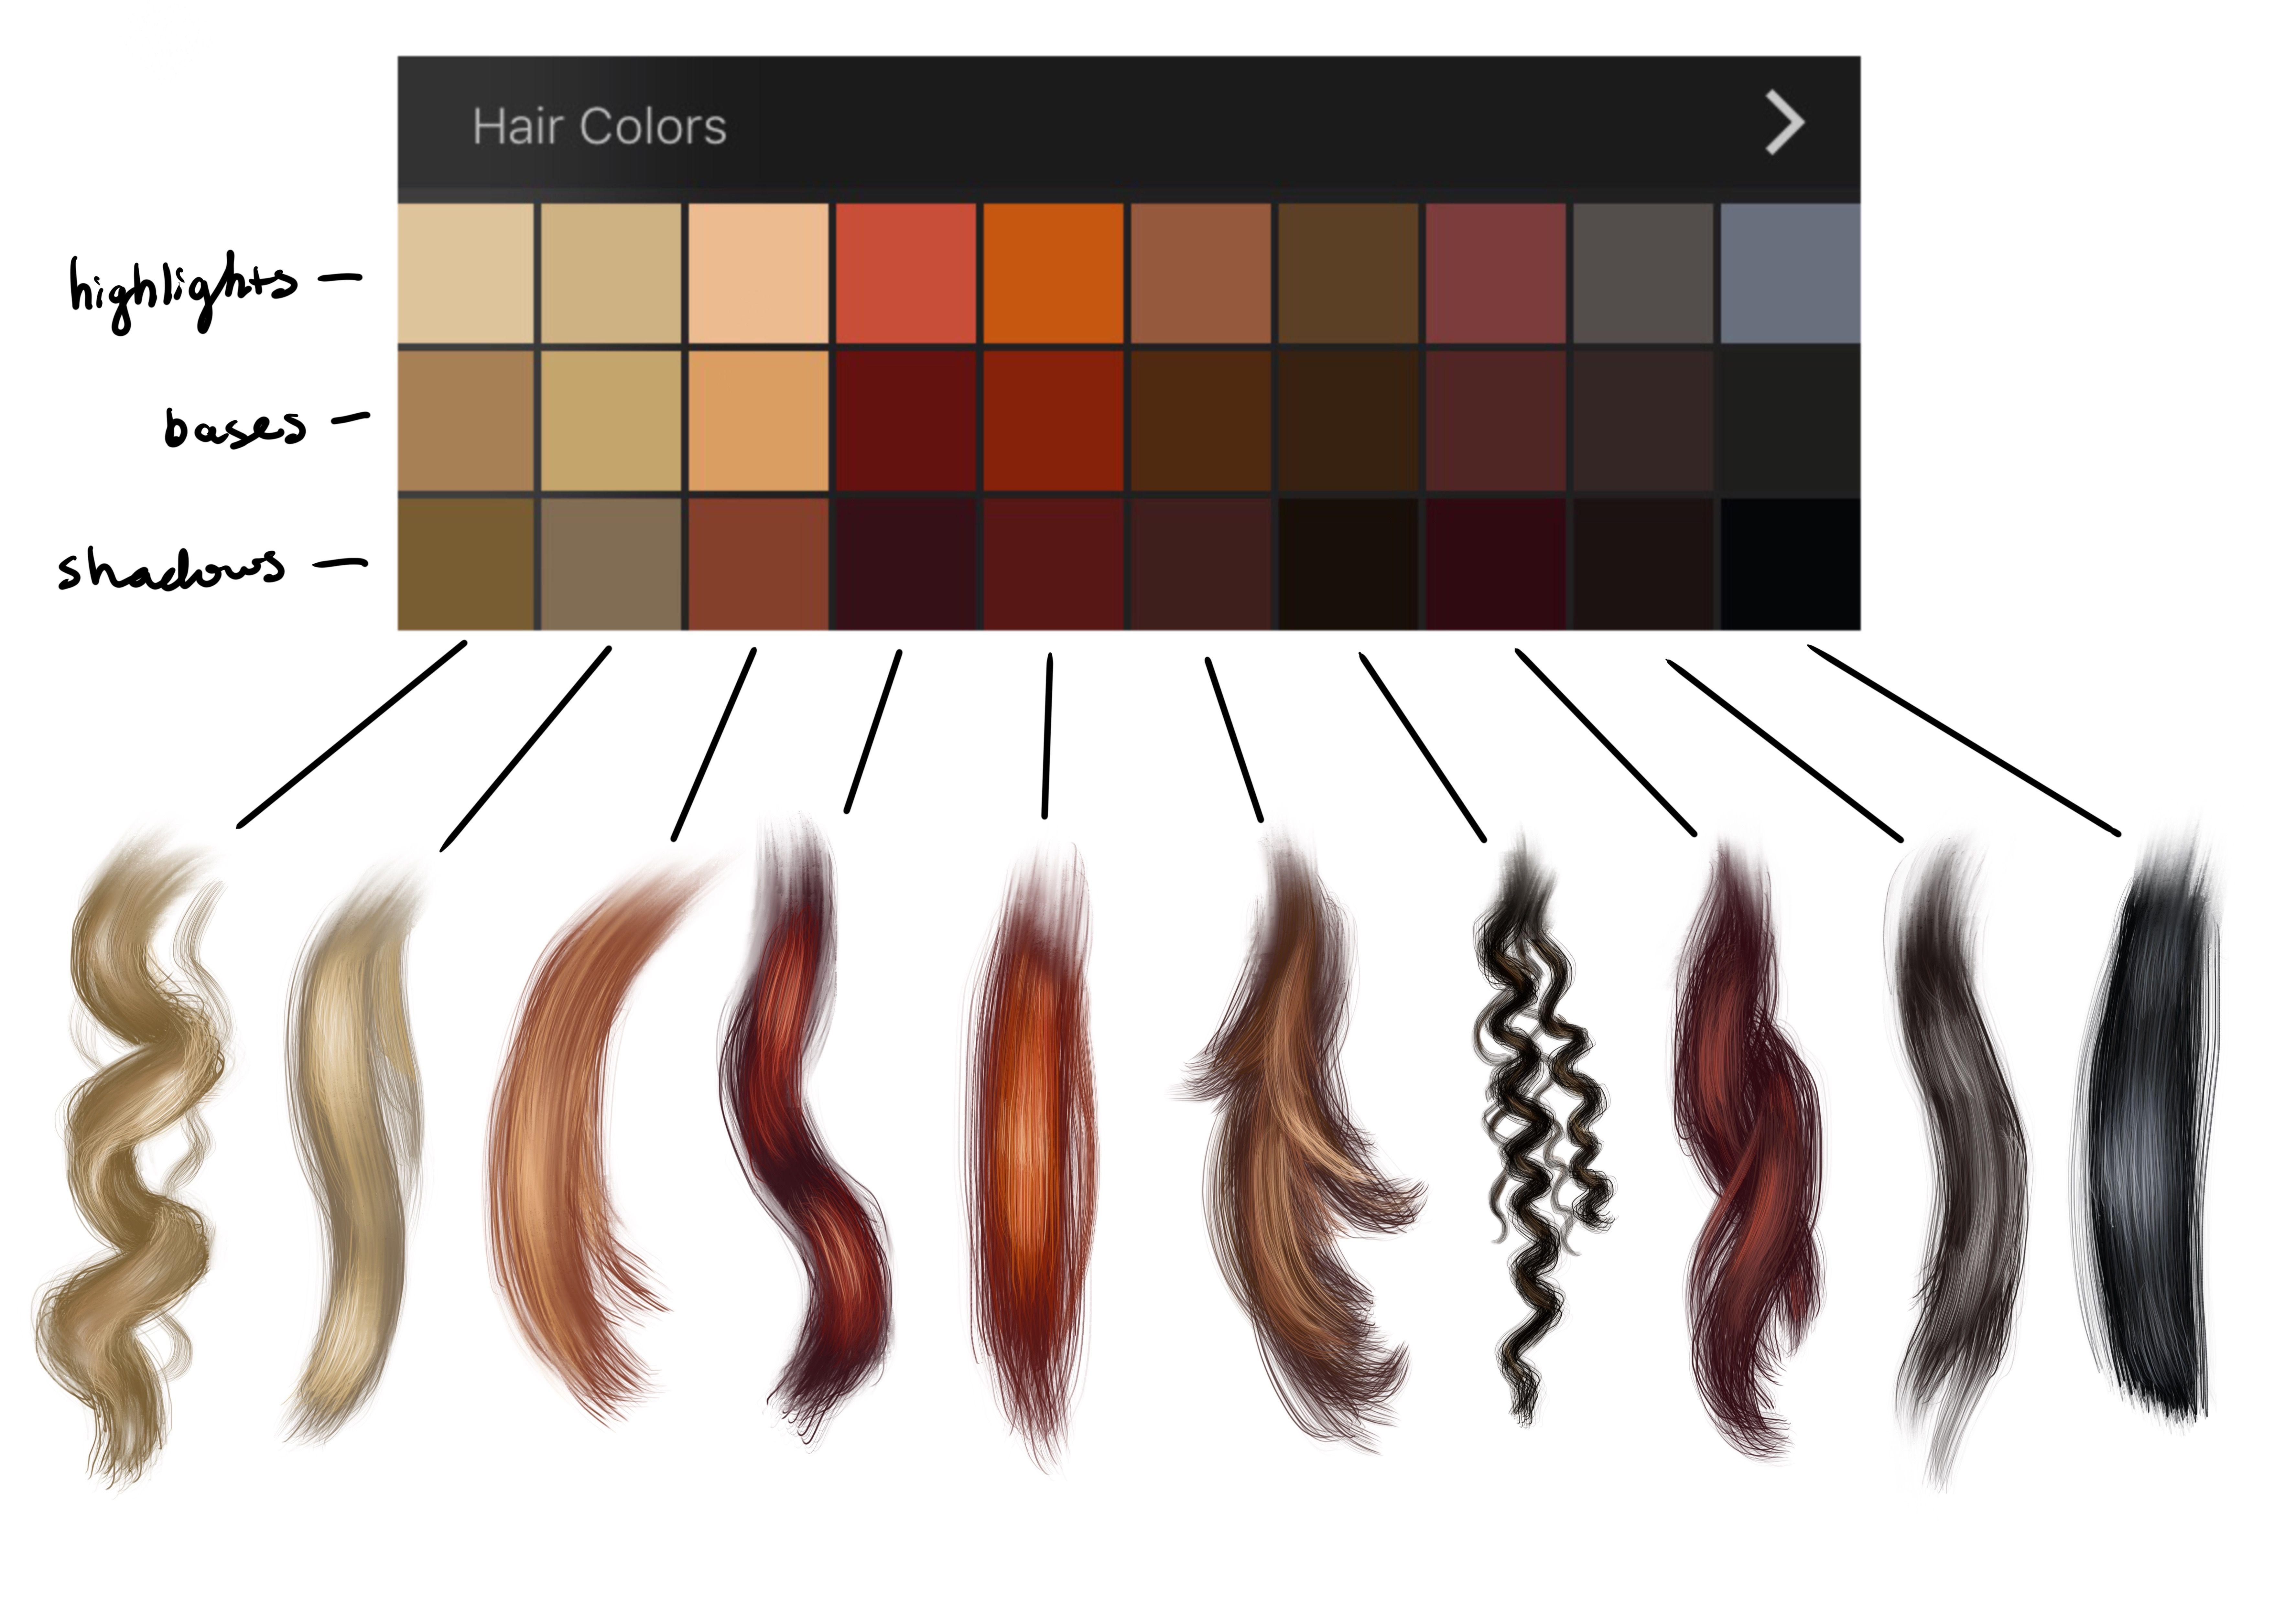 Hair Colors Palette Swatches In 2020 Palette Art Procreate Ipad Art Digital Painting Tutorials